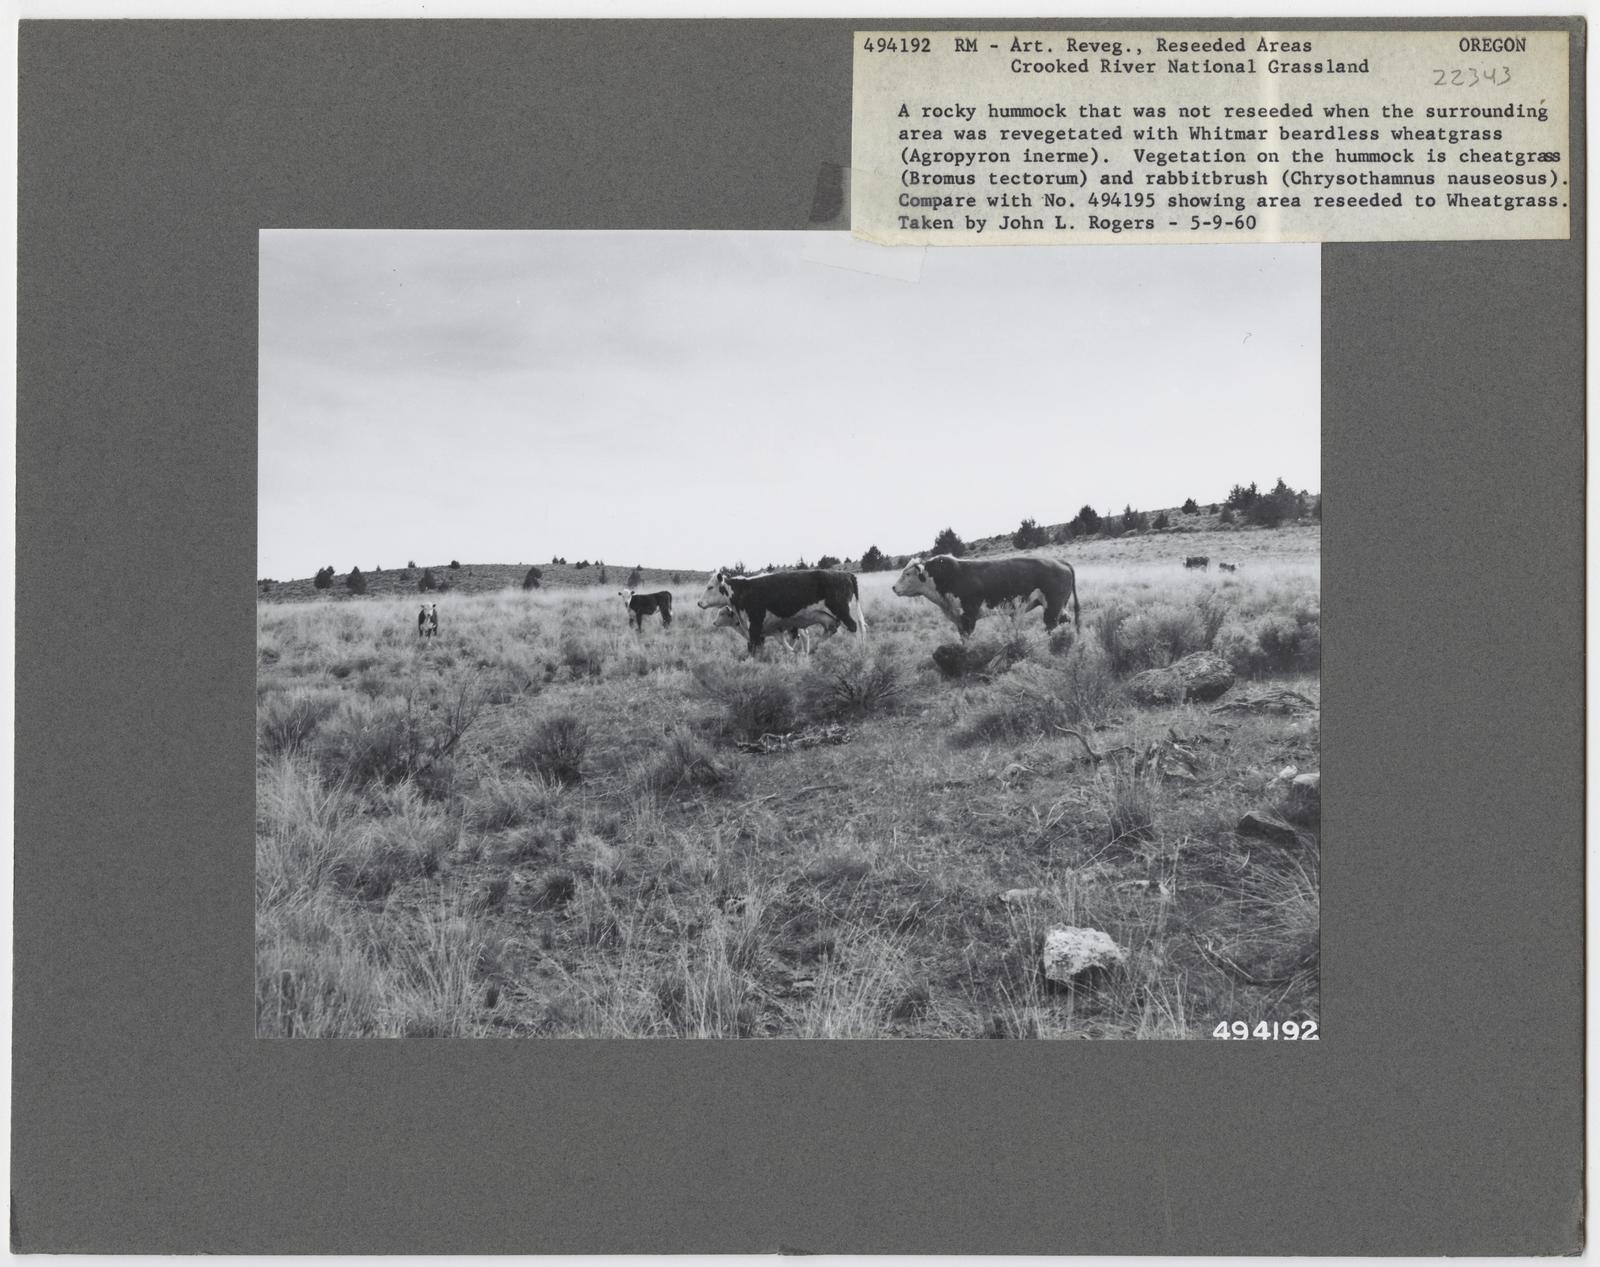 Range Revegetation - Plant Control - Oregon